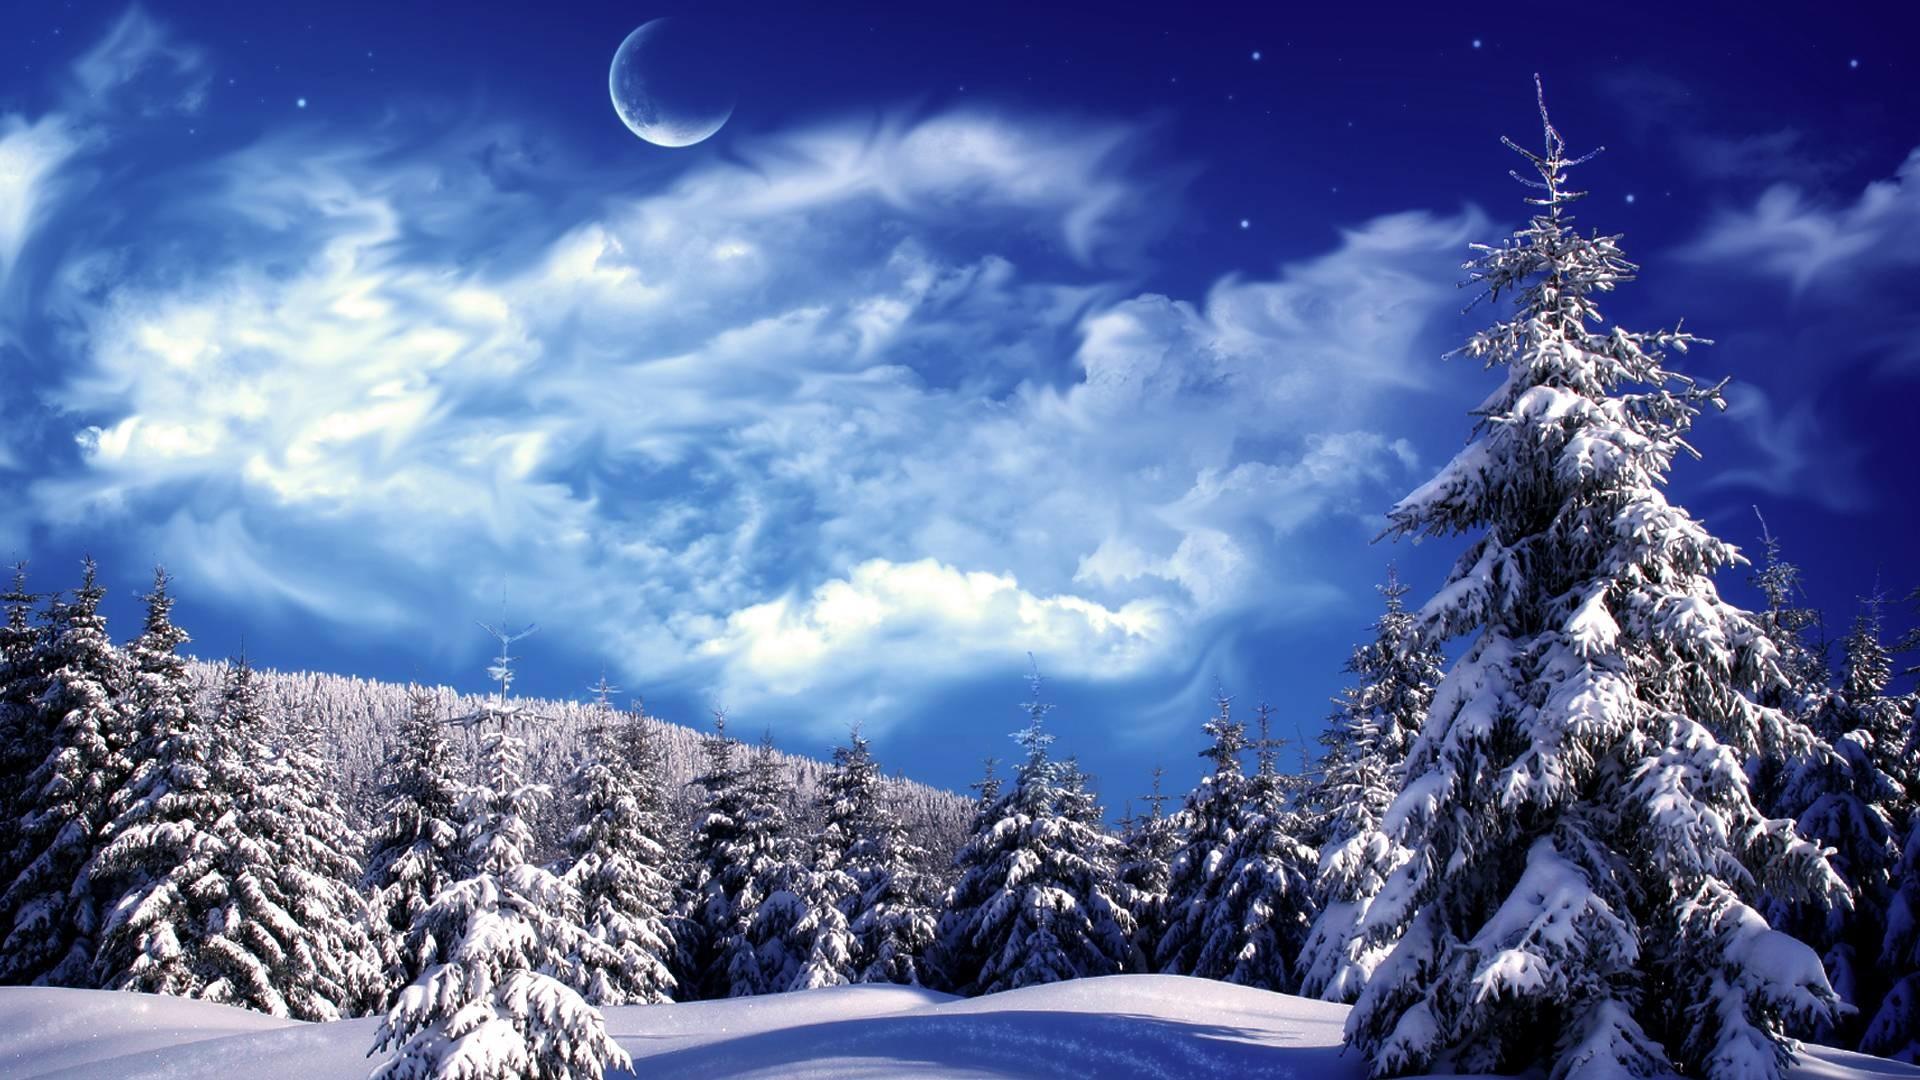 Winter Wonderland Wallpaper Wide or HD | Fantasy Wallpapers